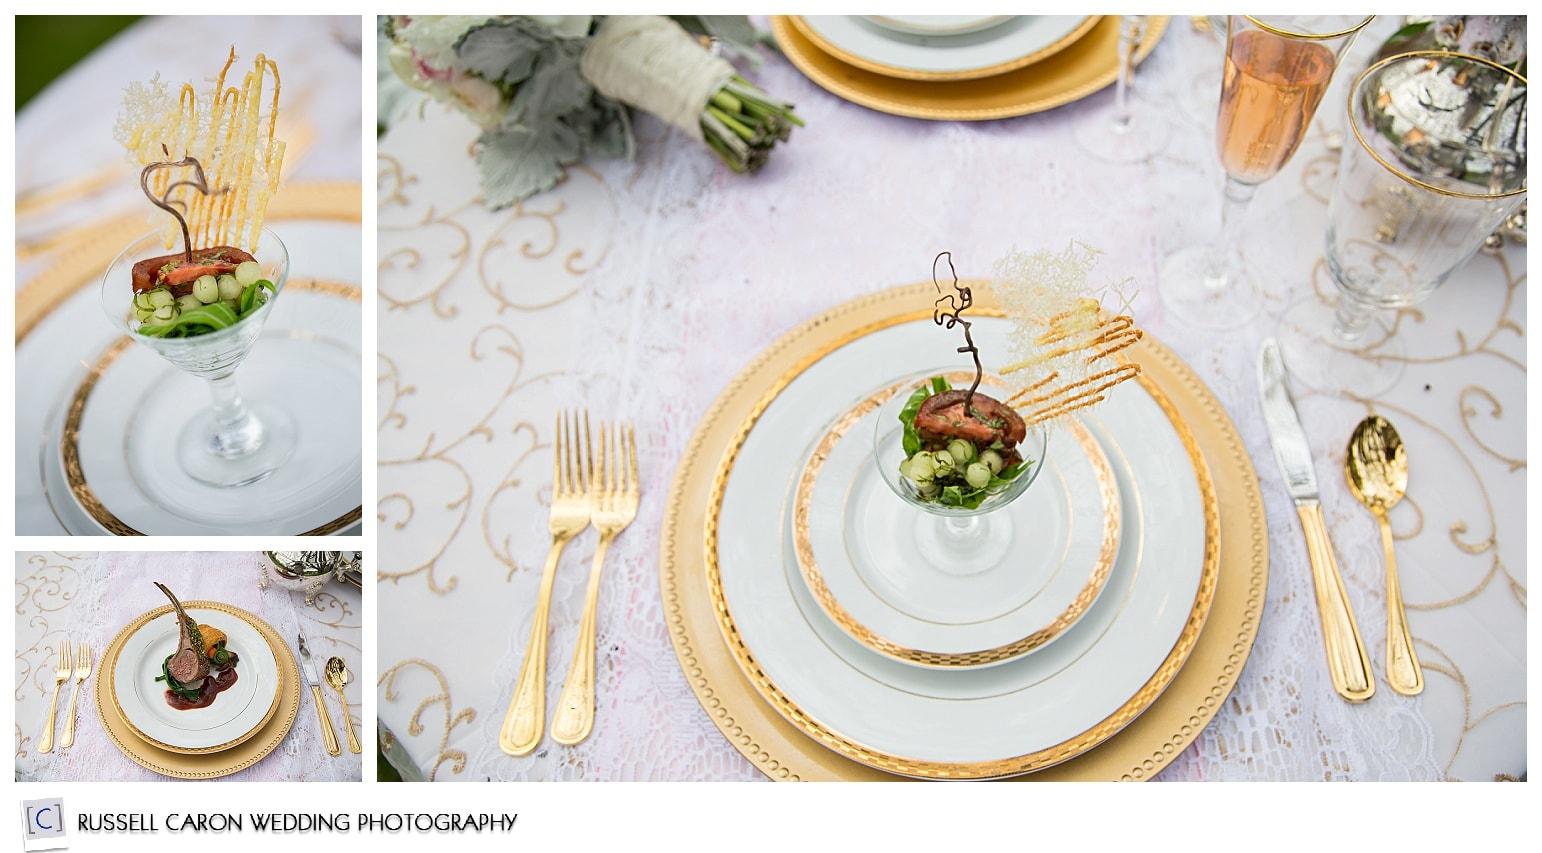 Food photos at a Norumbega Inn wedding, Camden Maine weddings